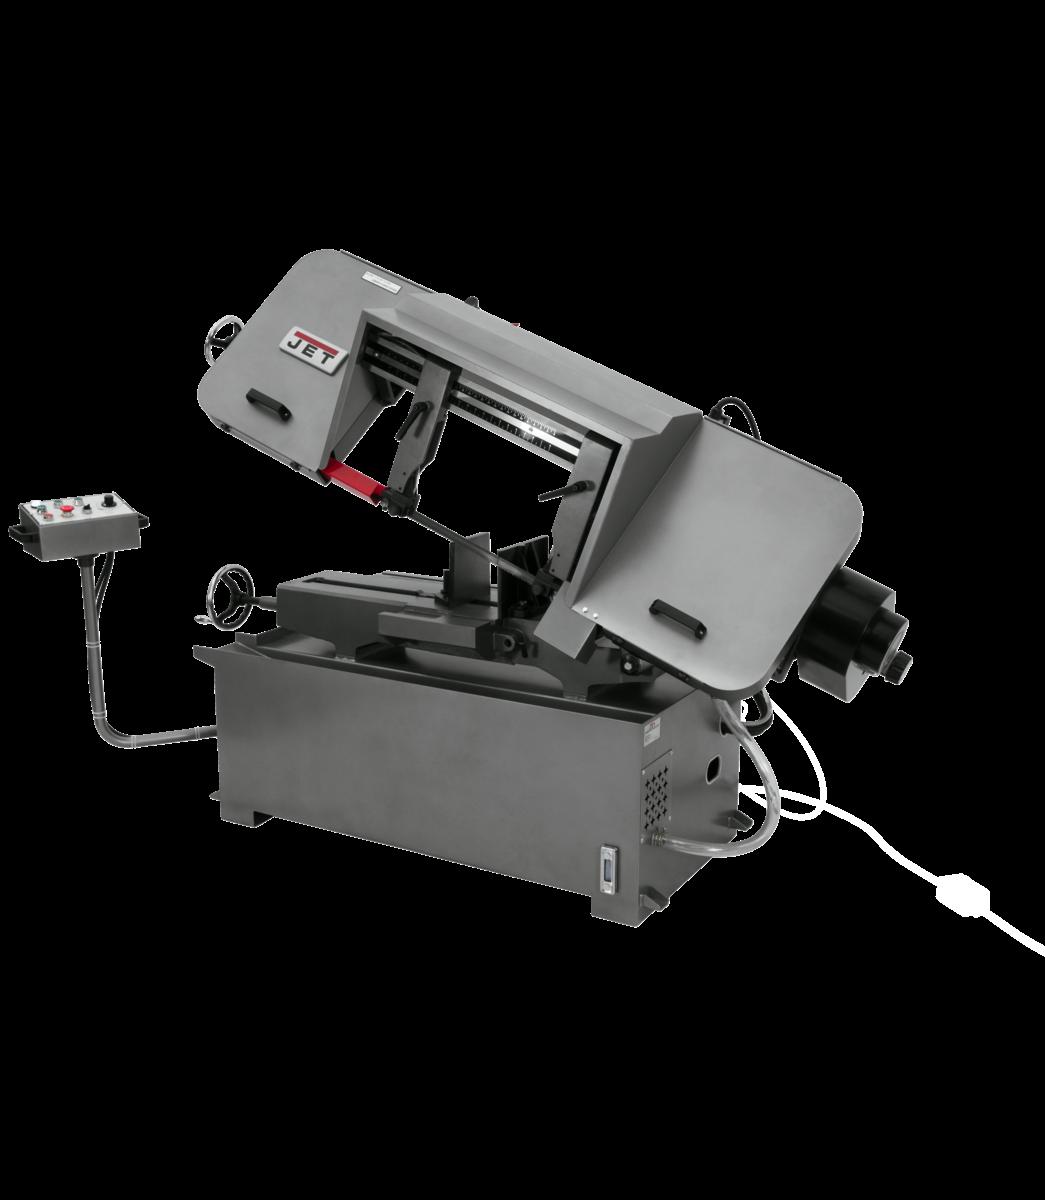 "J-7060-4, 12"" x 20"" Semi-Automatic Horizontal Bandsaw"